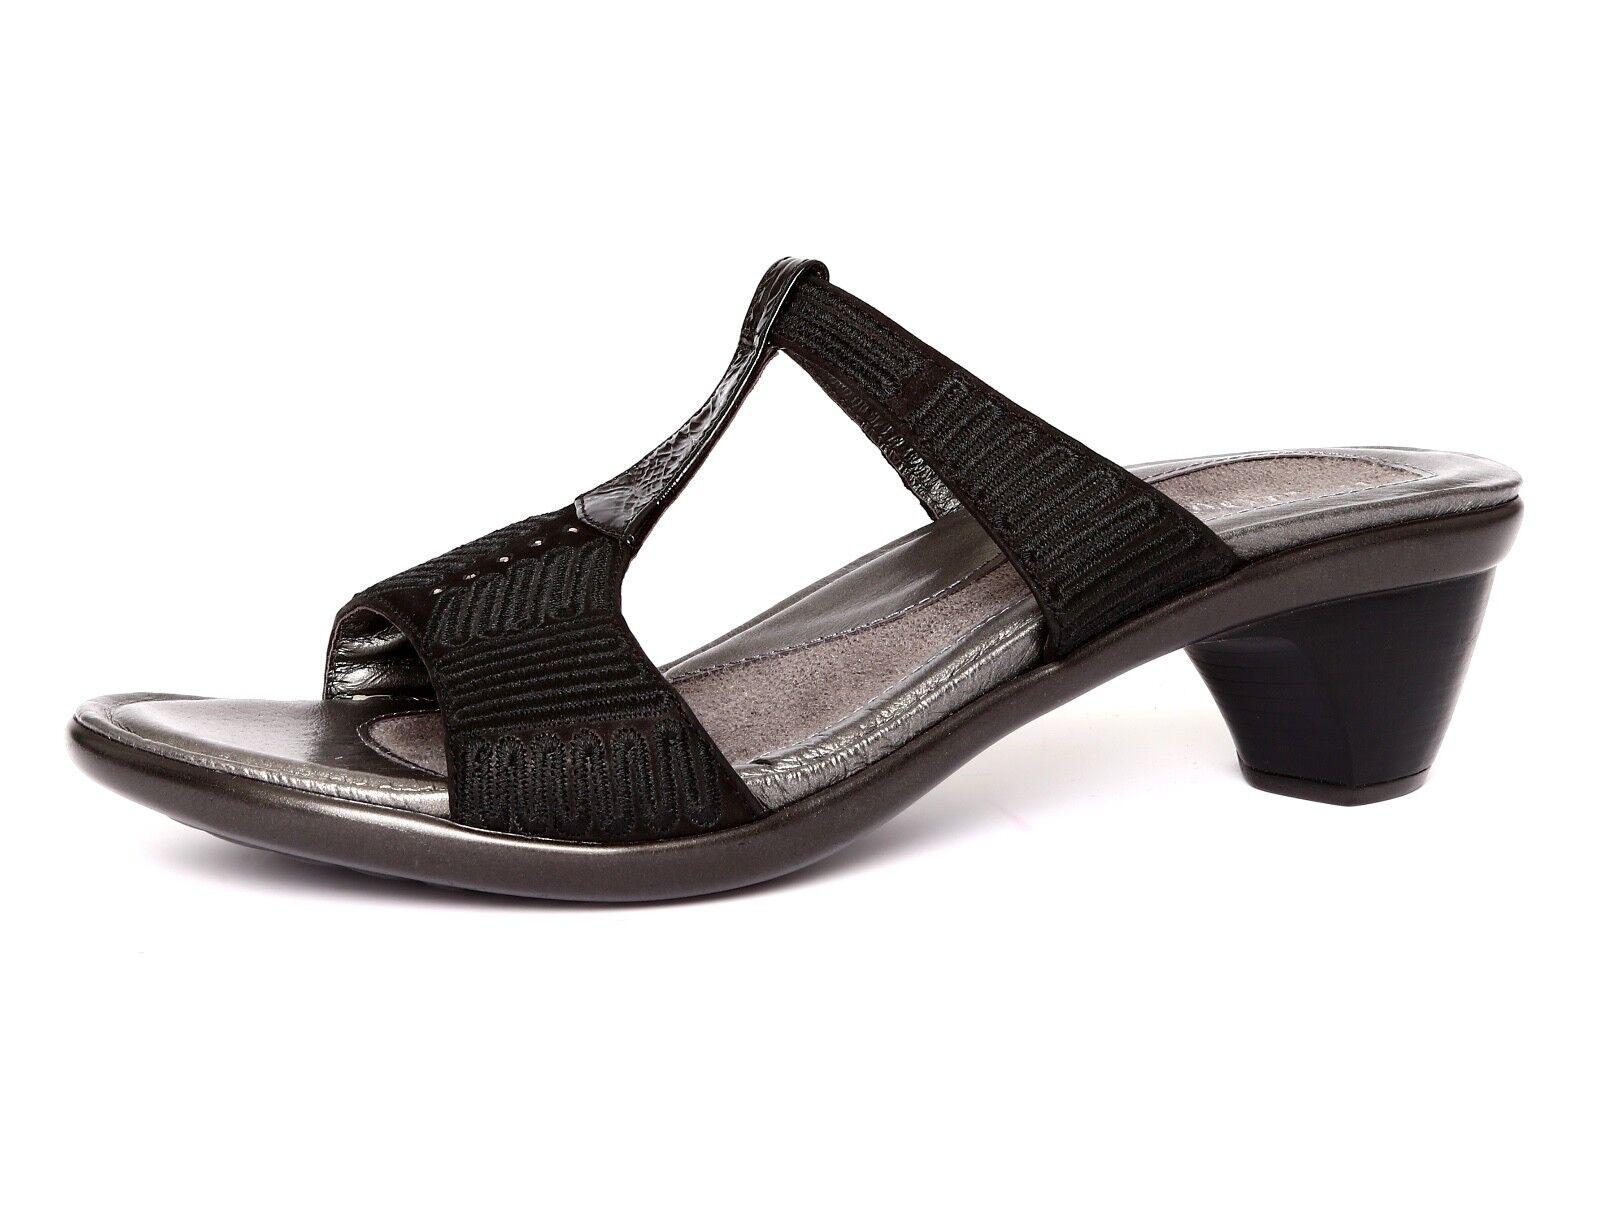 Naot Footwear Delia Women's Black Velvet Leather Leather Leather Size (US 10) (EU 41) 1210 b4efc8